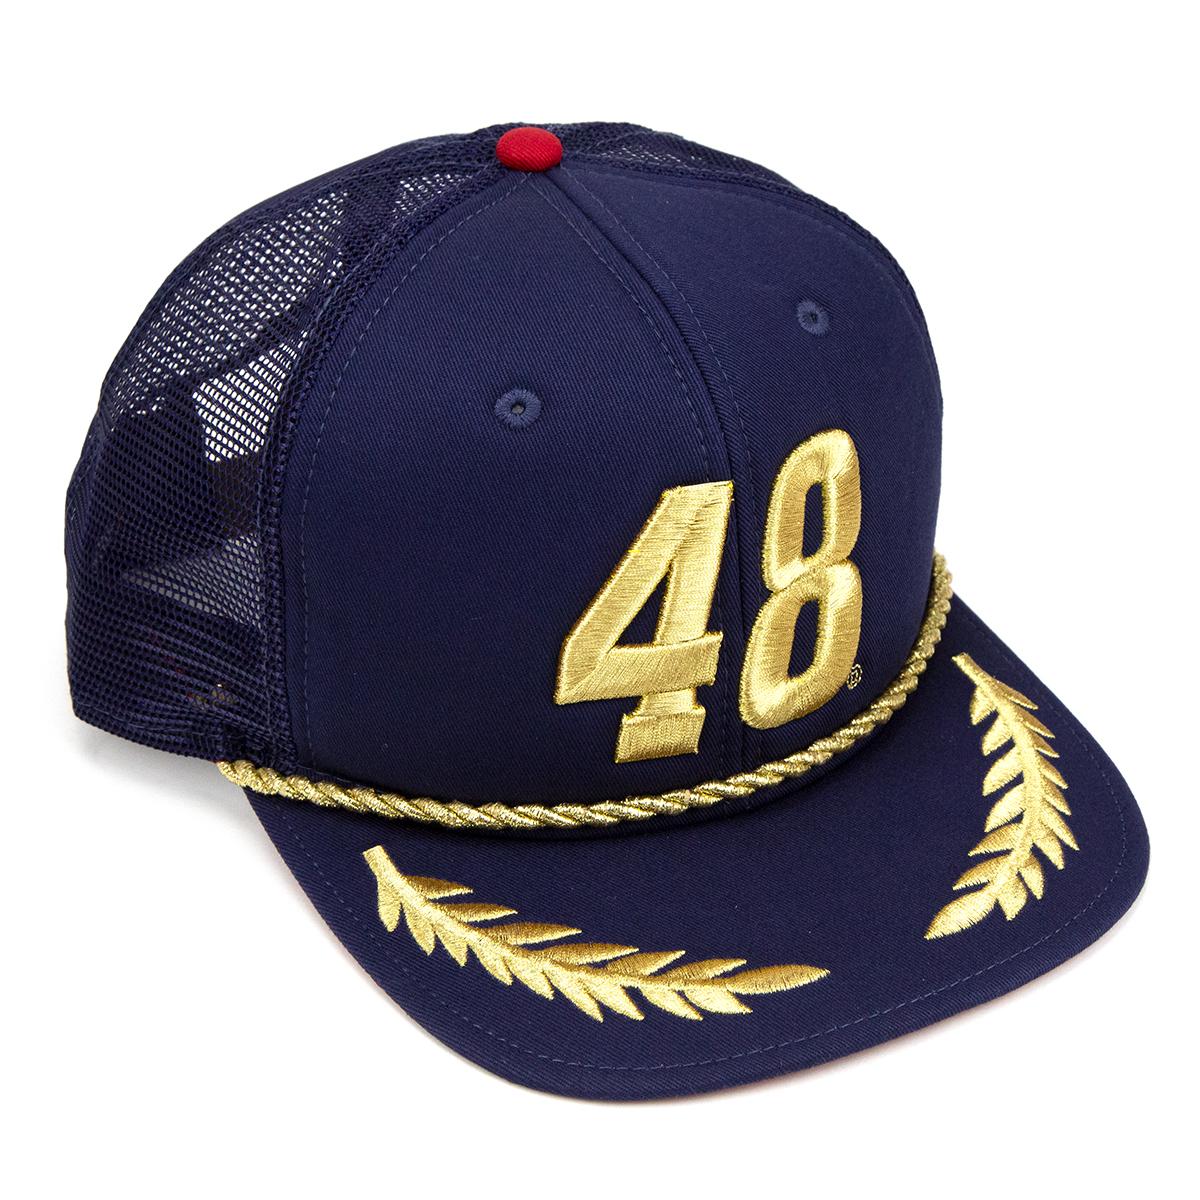 Jimmie Johnson #48 2019 NASCAR New Era HC950 Scrambled Hat